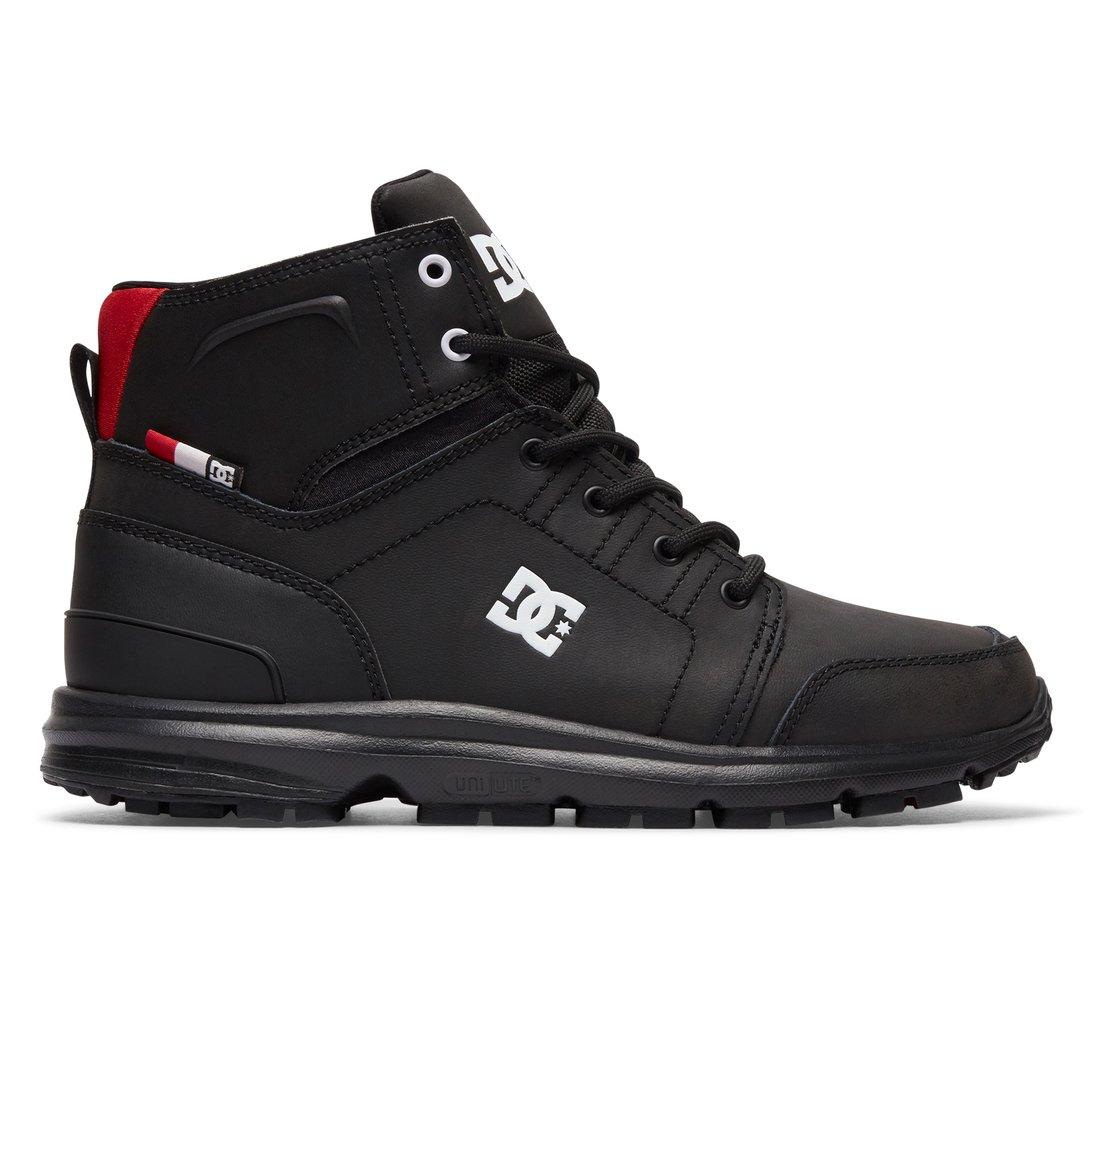 8b0fad3d473 DC Shoes Men's Torstein Boot 10 M Black/athletic Red/white